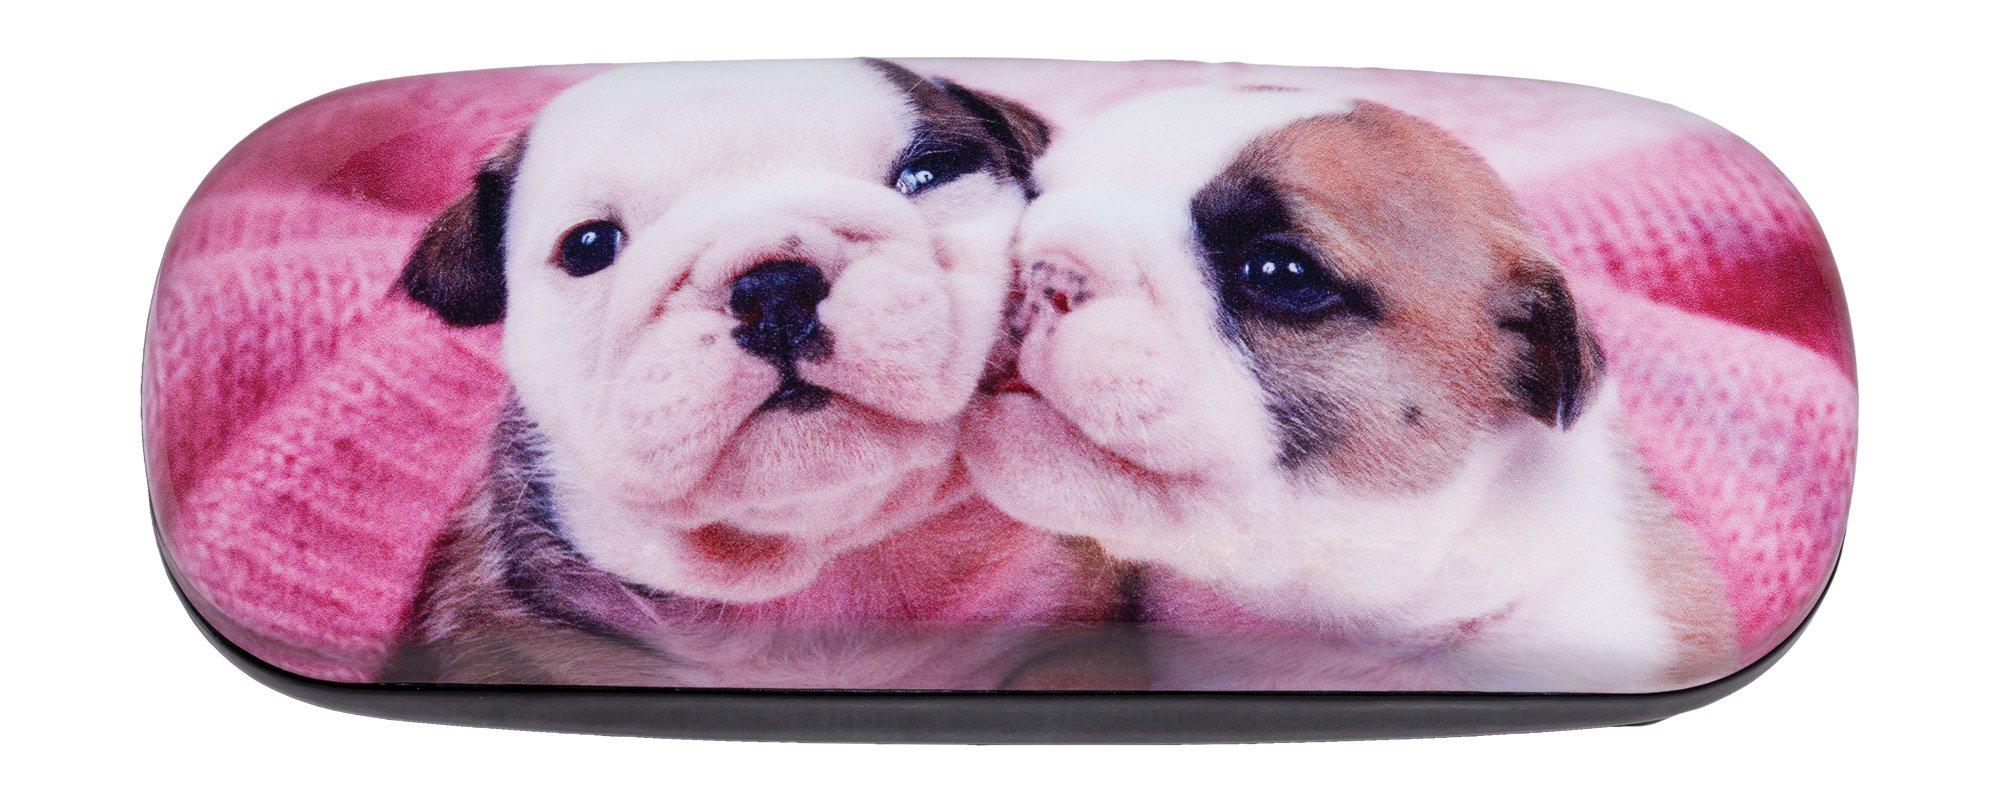 Hard Shiny Eyeglass Case Adorned With Photo Of Adorable English Bulldog Puppies